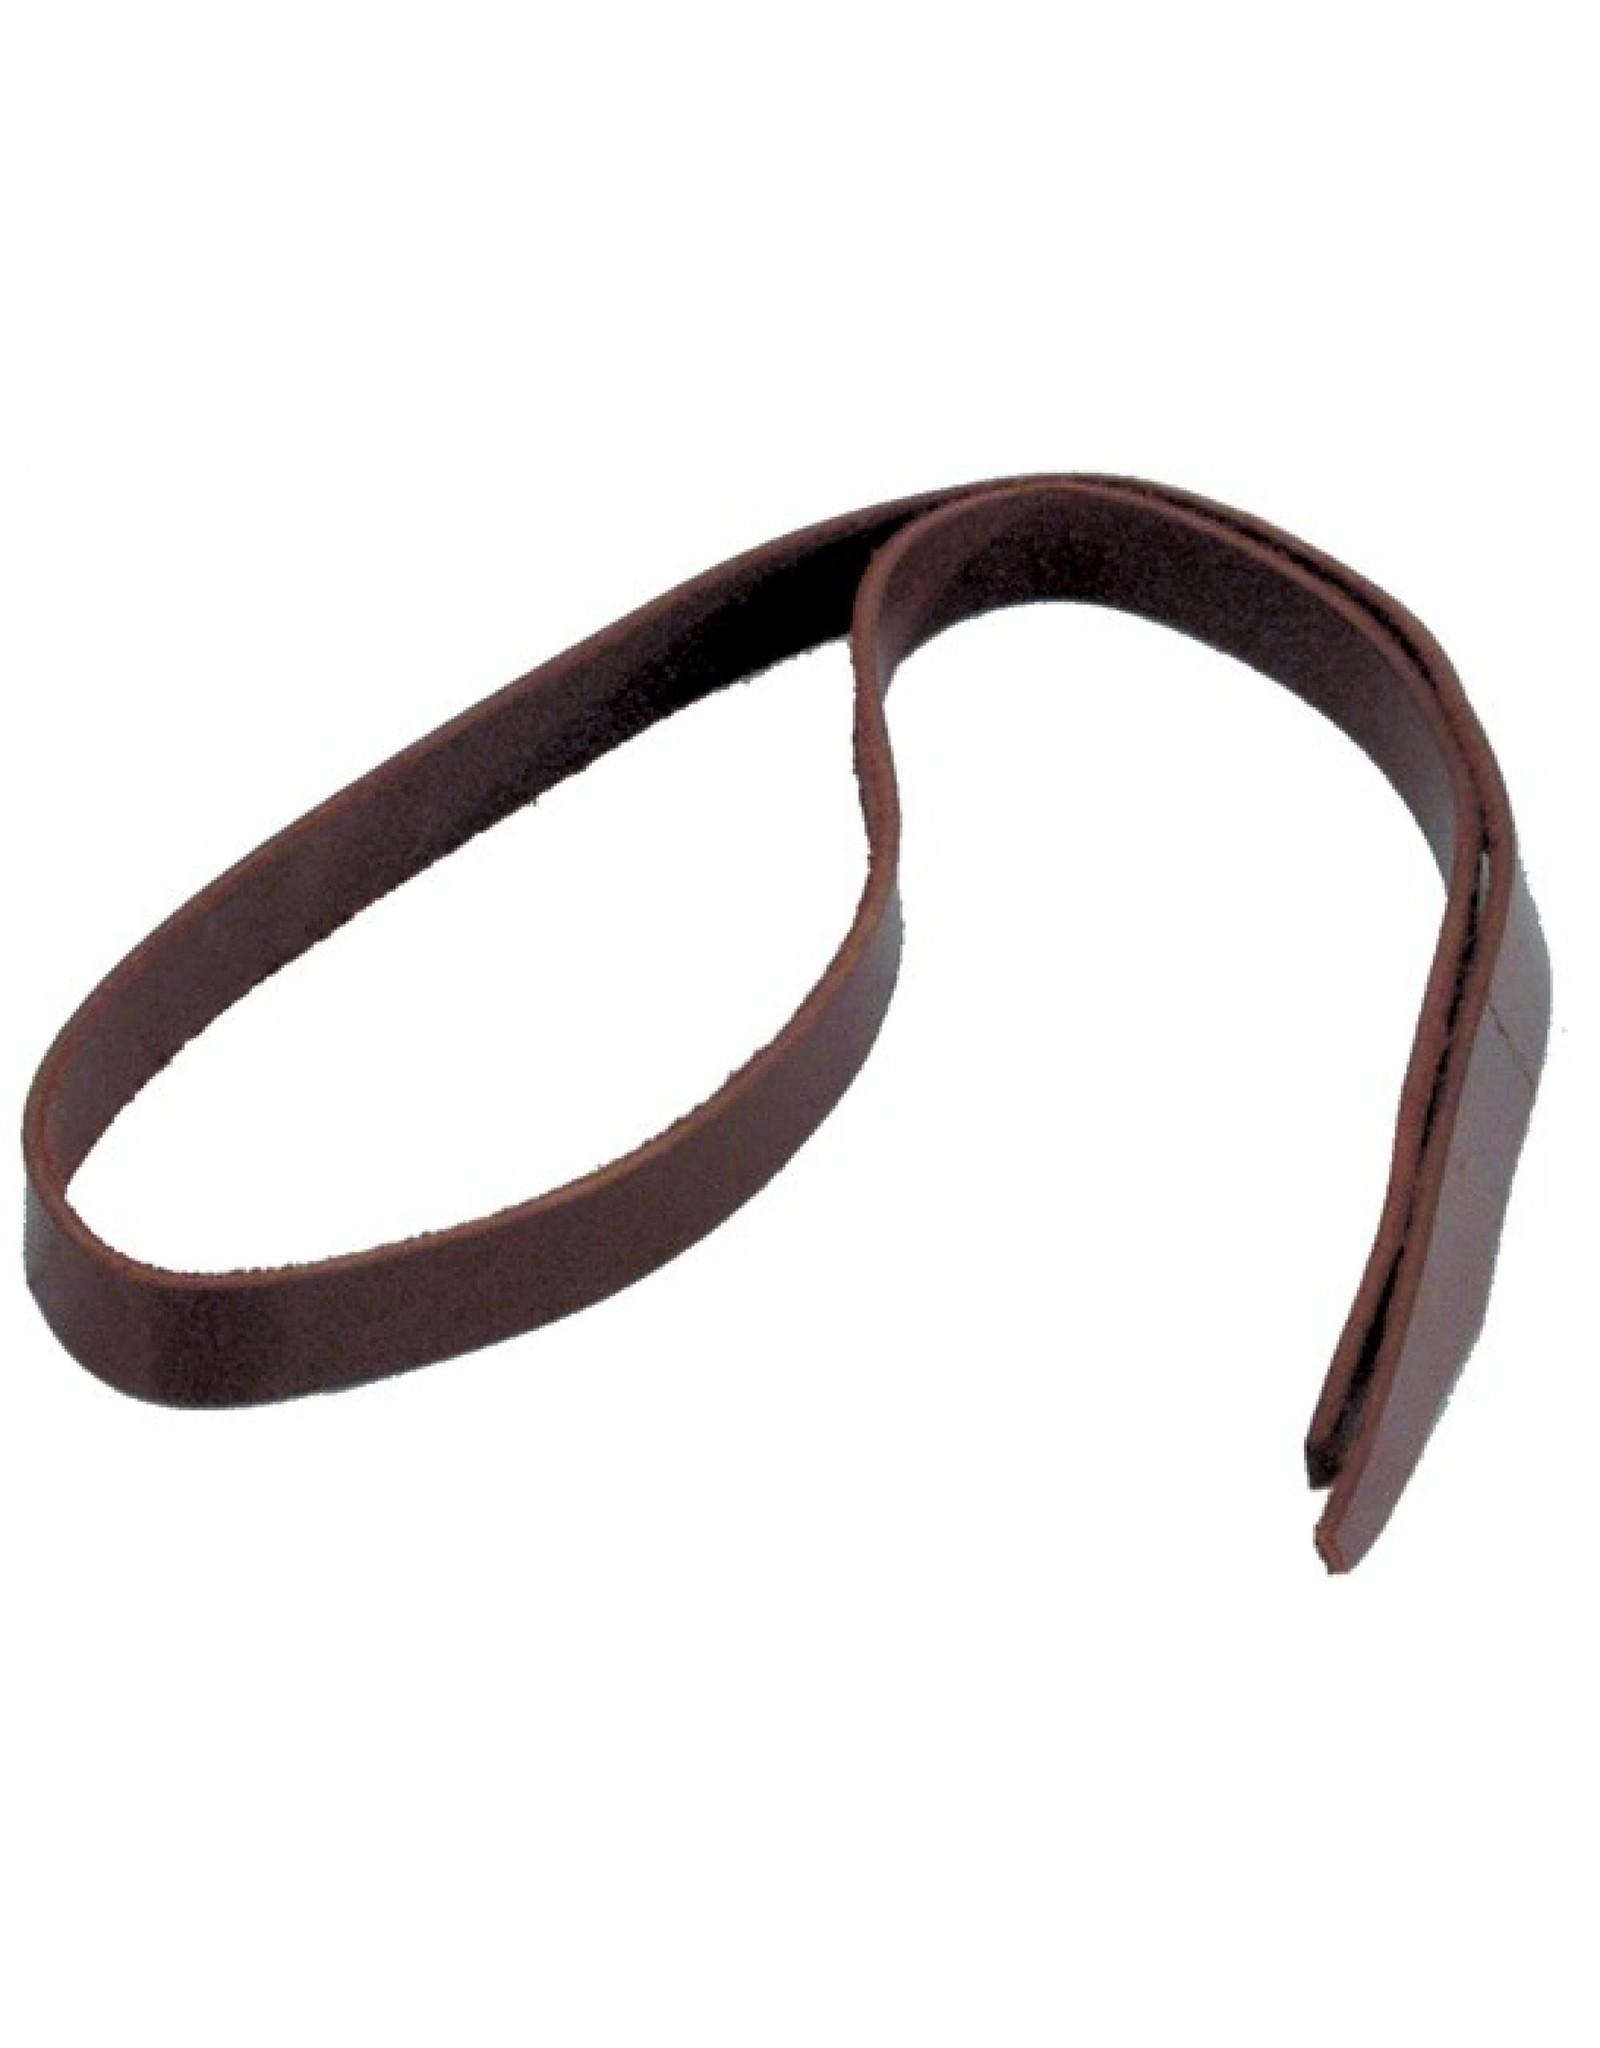 "Western Rawhide Saddle String 72"" Black"